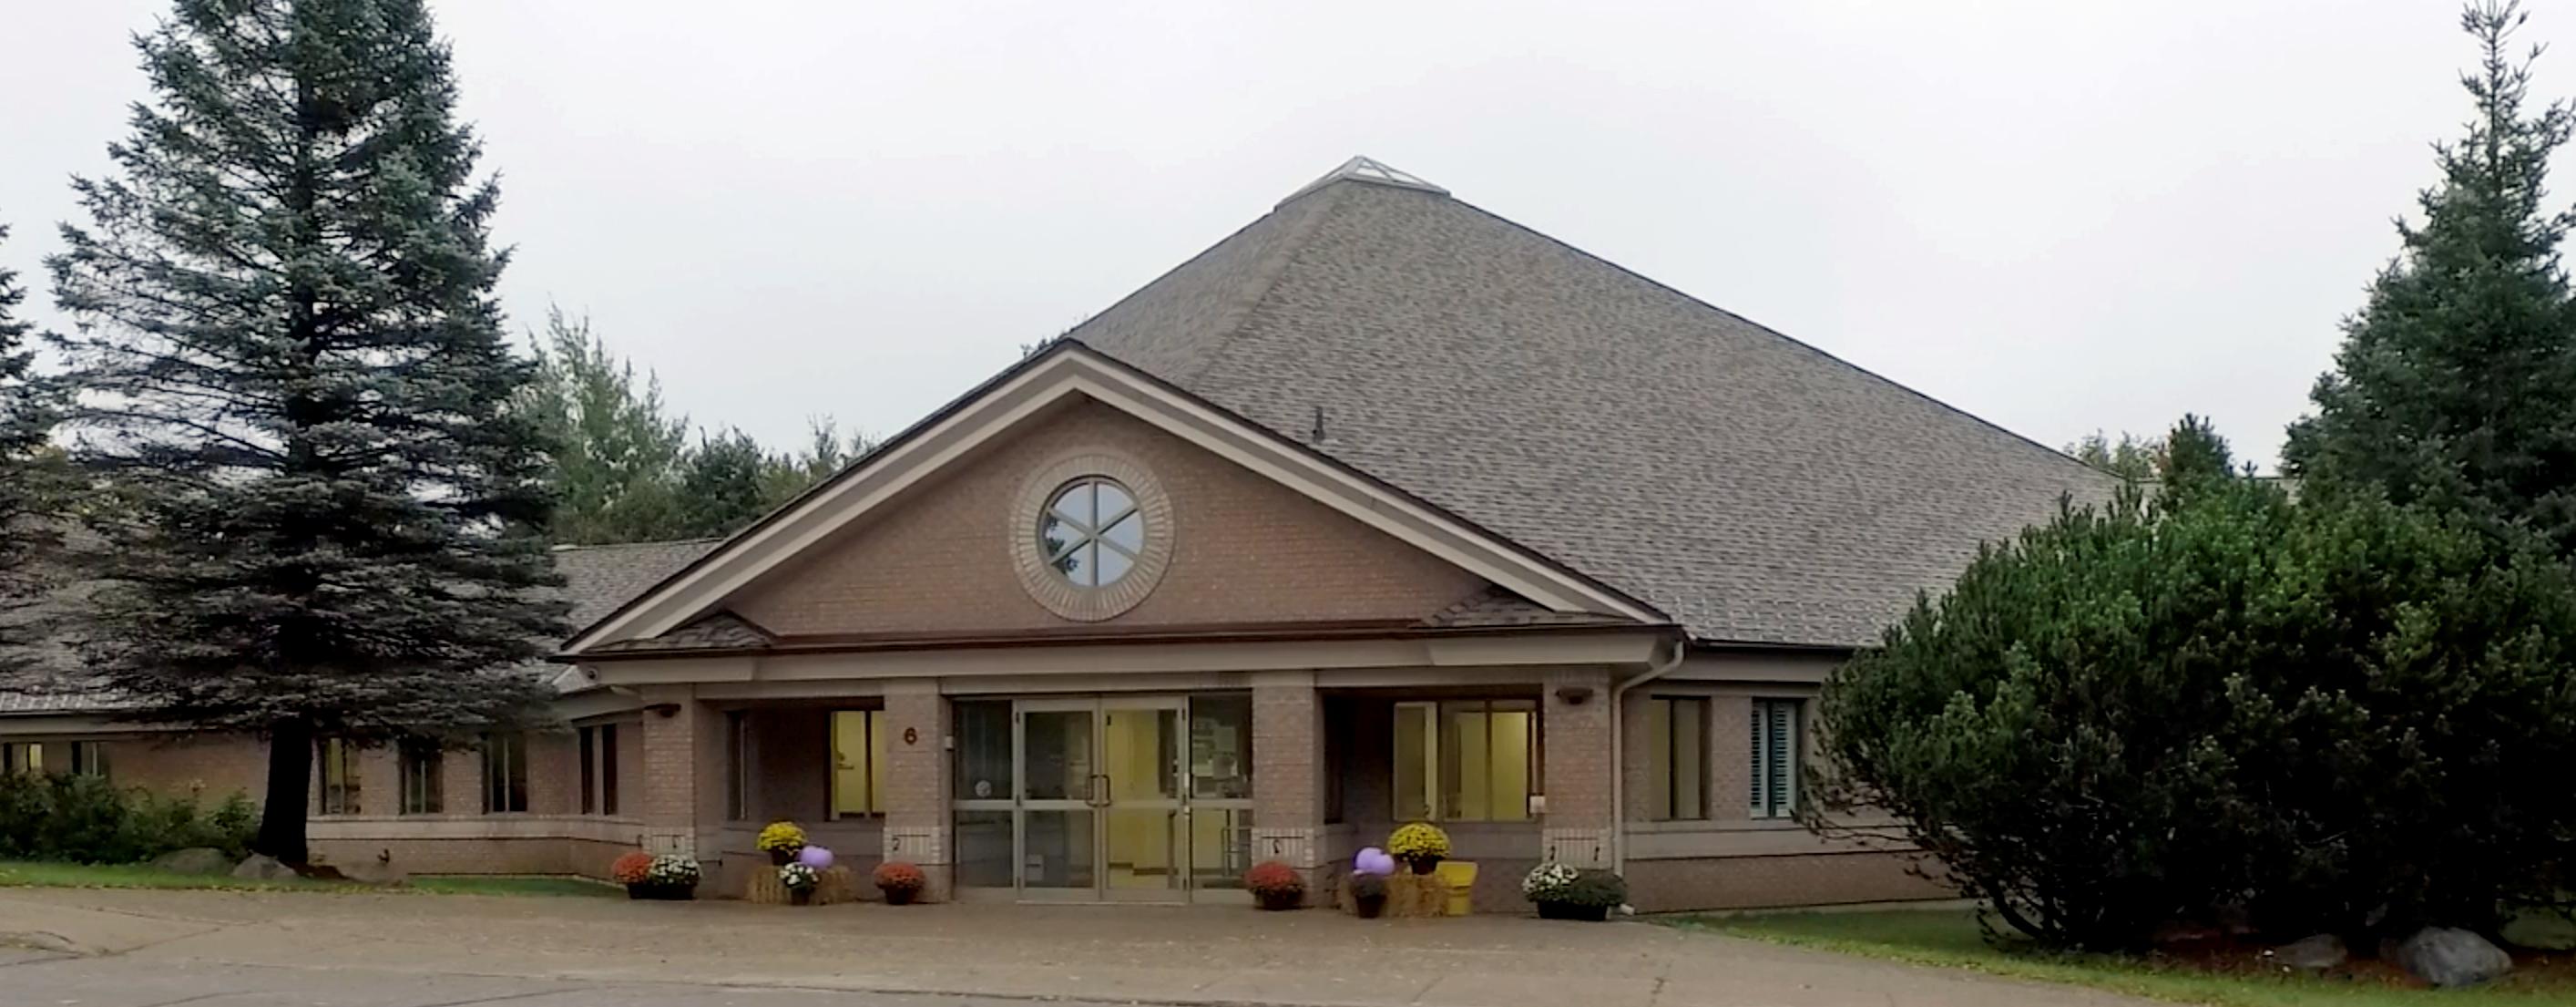 photo of arbour house exterior